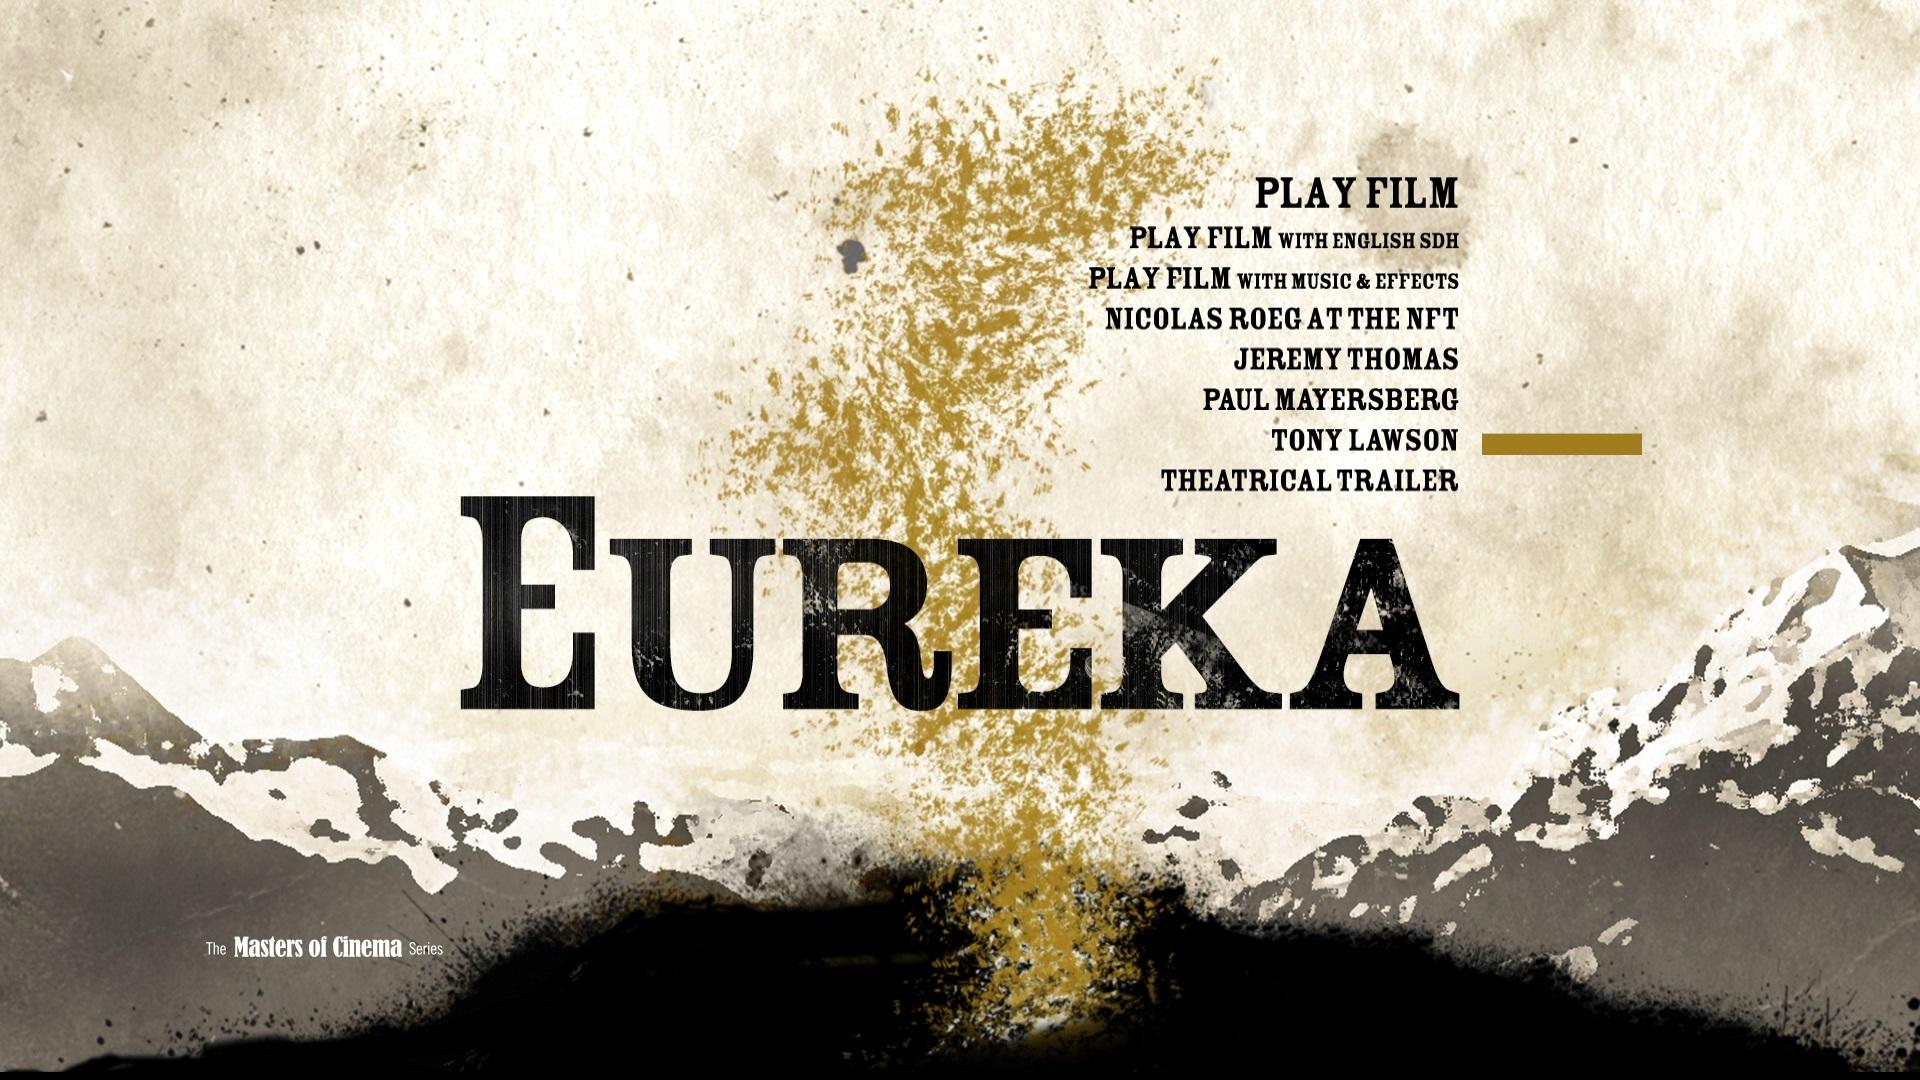 Eureka (1983) [Masters of Cinema - Eureka!]